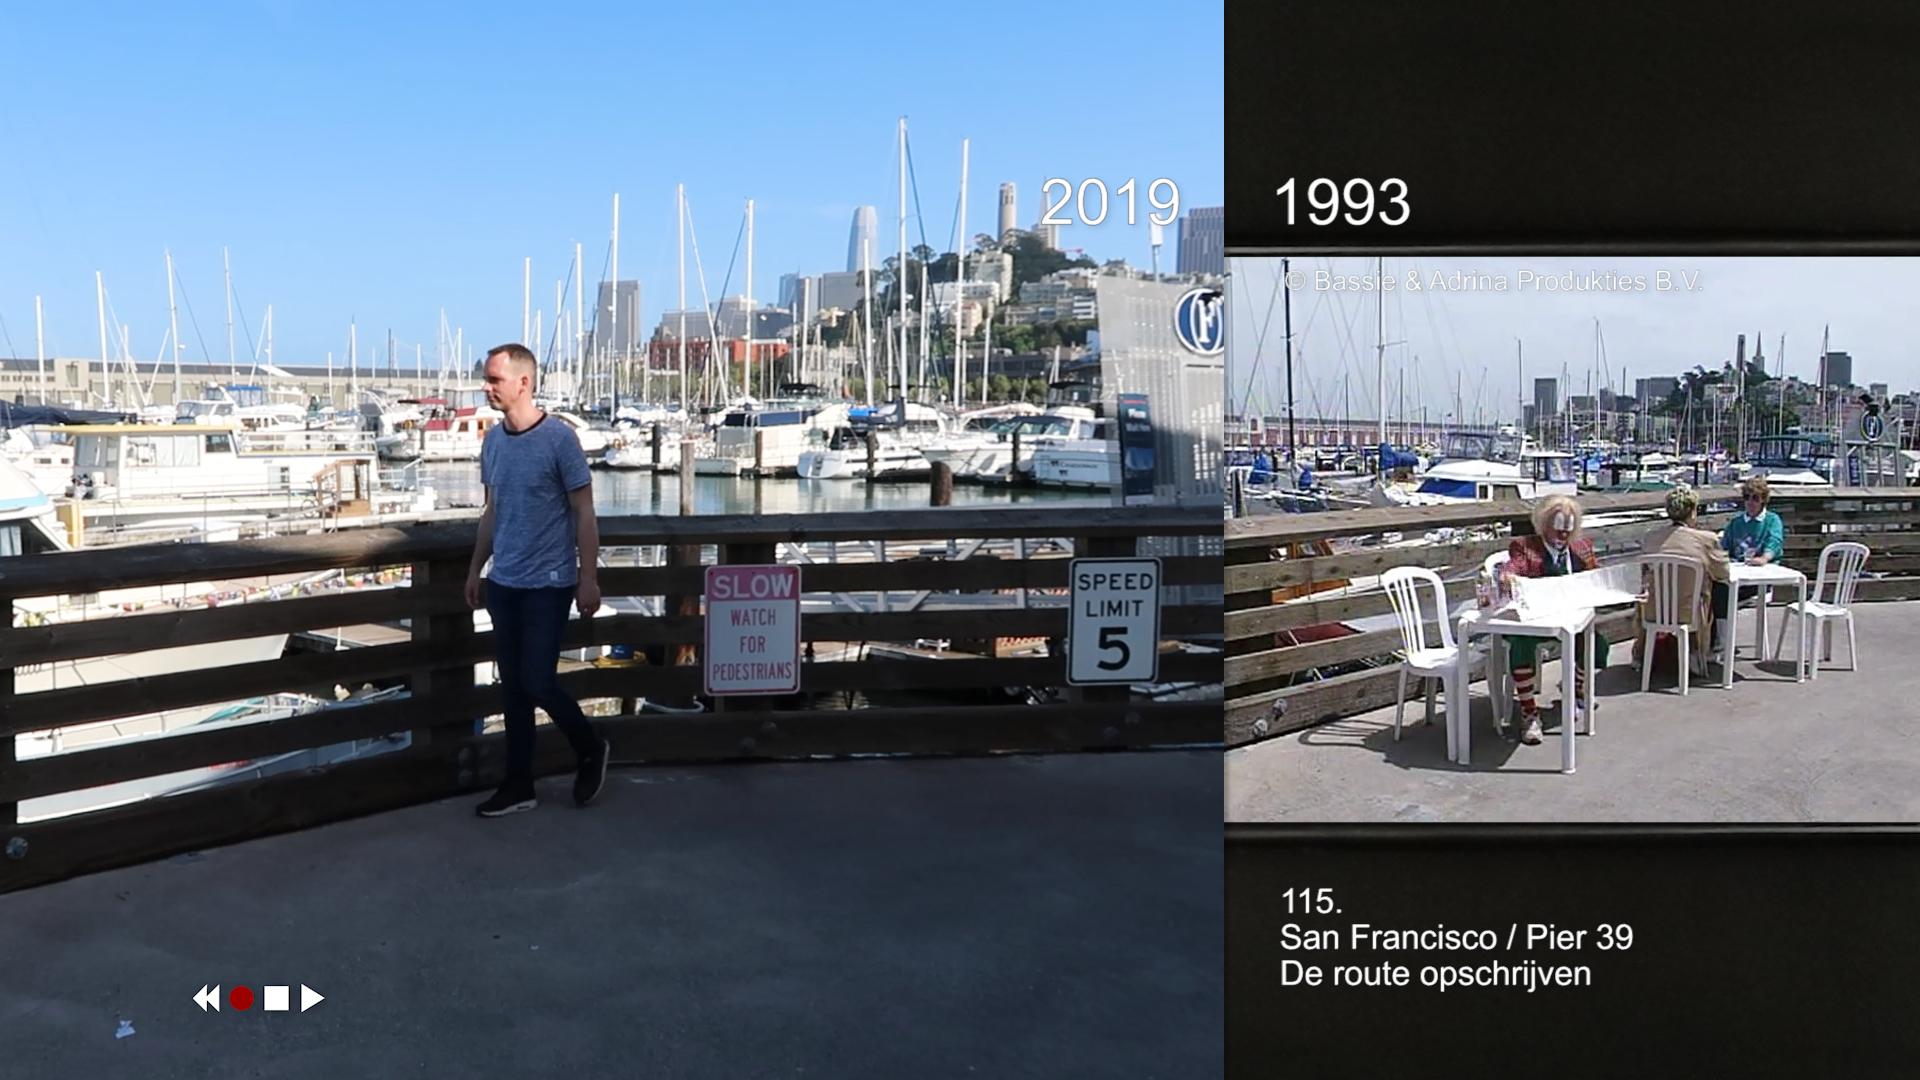 Bassie en Adriaan / Pier 39